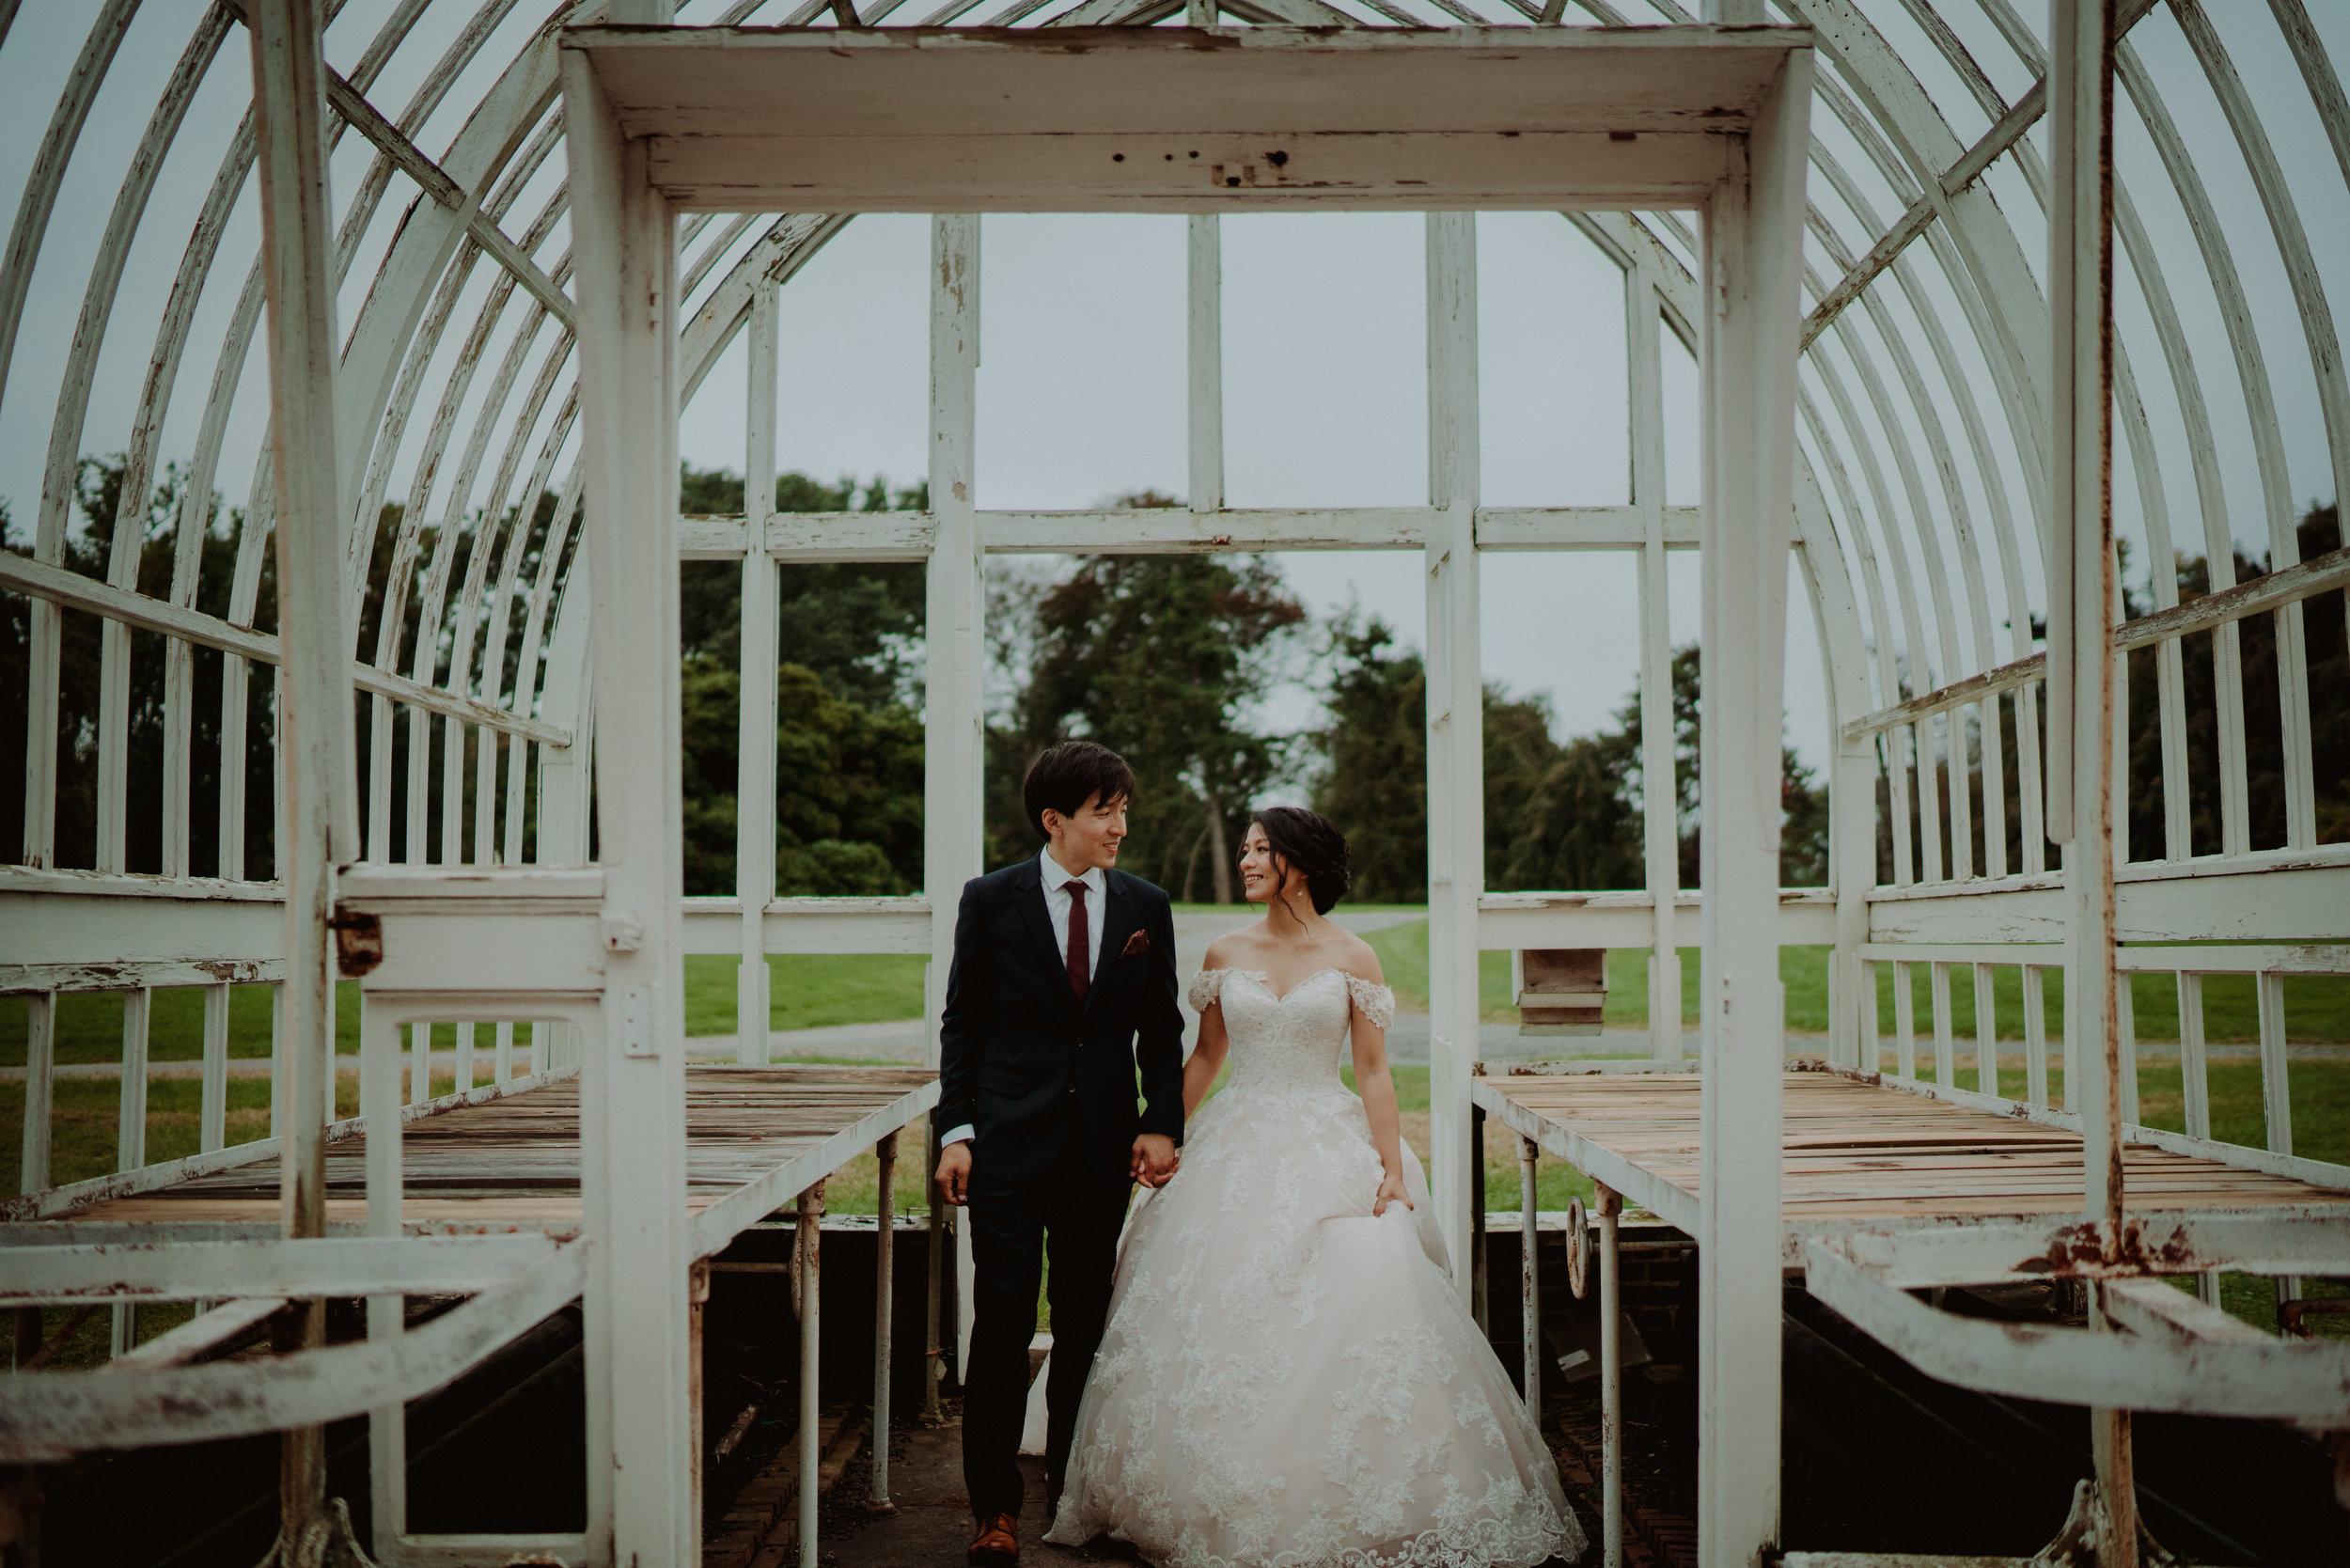 Irene-and-Jae-2019_Brooklyn_Wedding_Photographer_Chellise_Michael_Photography--46.jpg